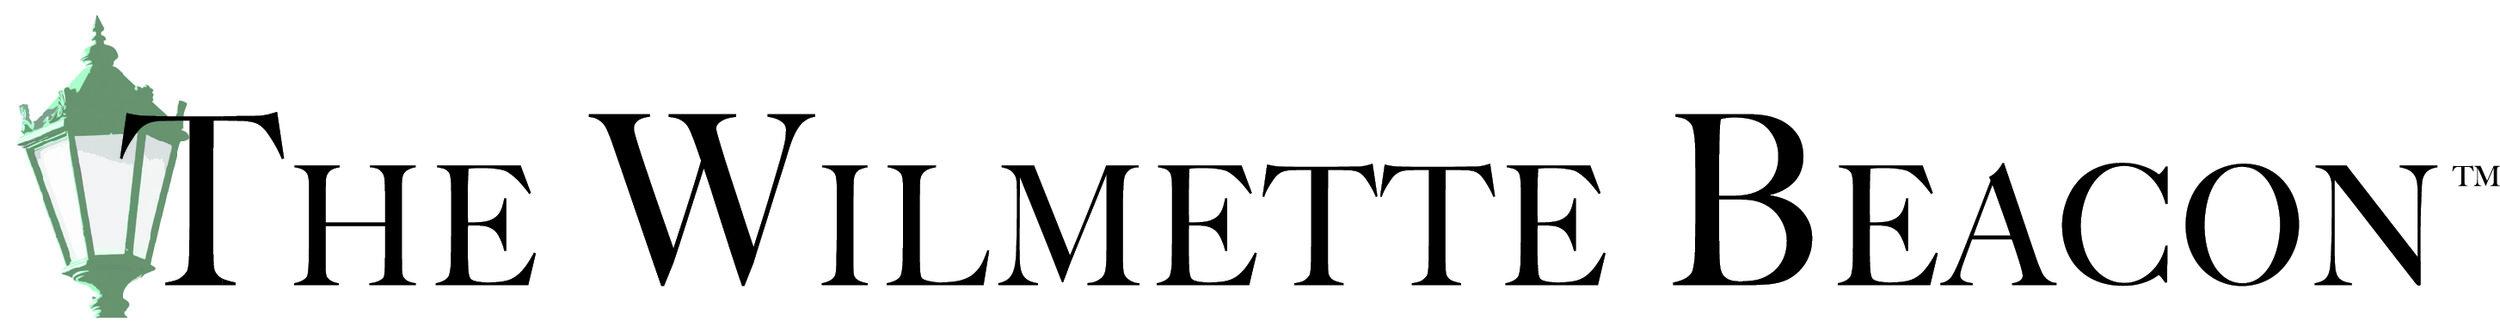 WilmetteBeacon-logo.jpg